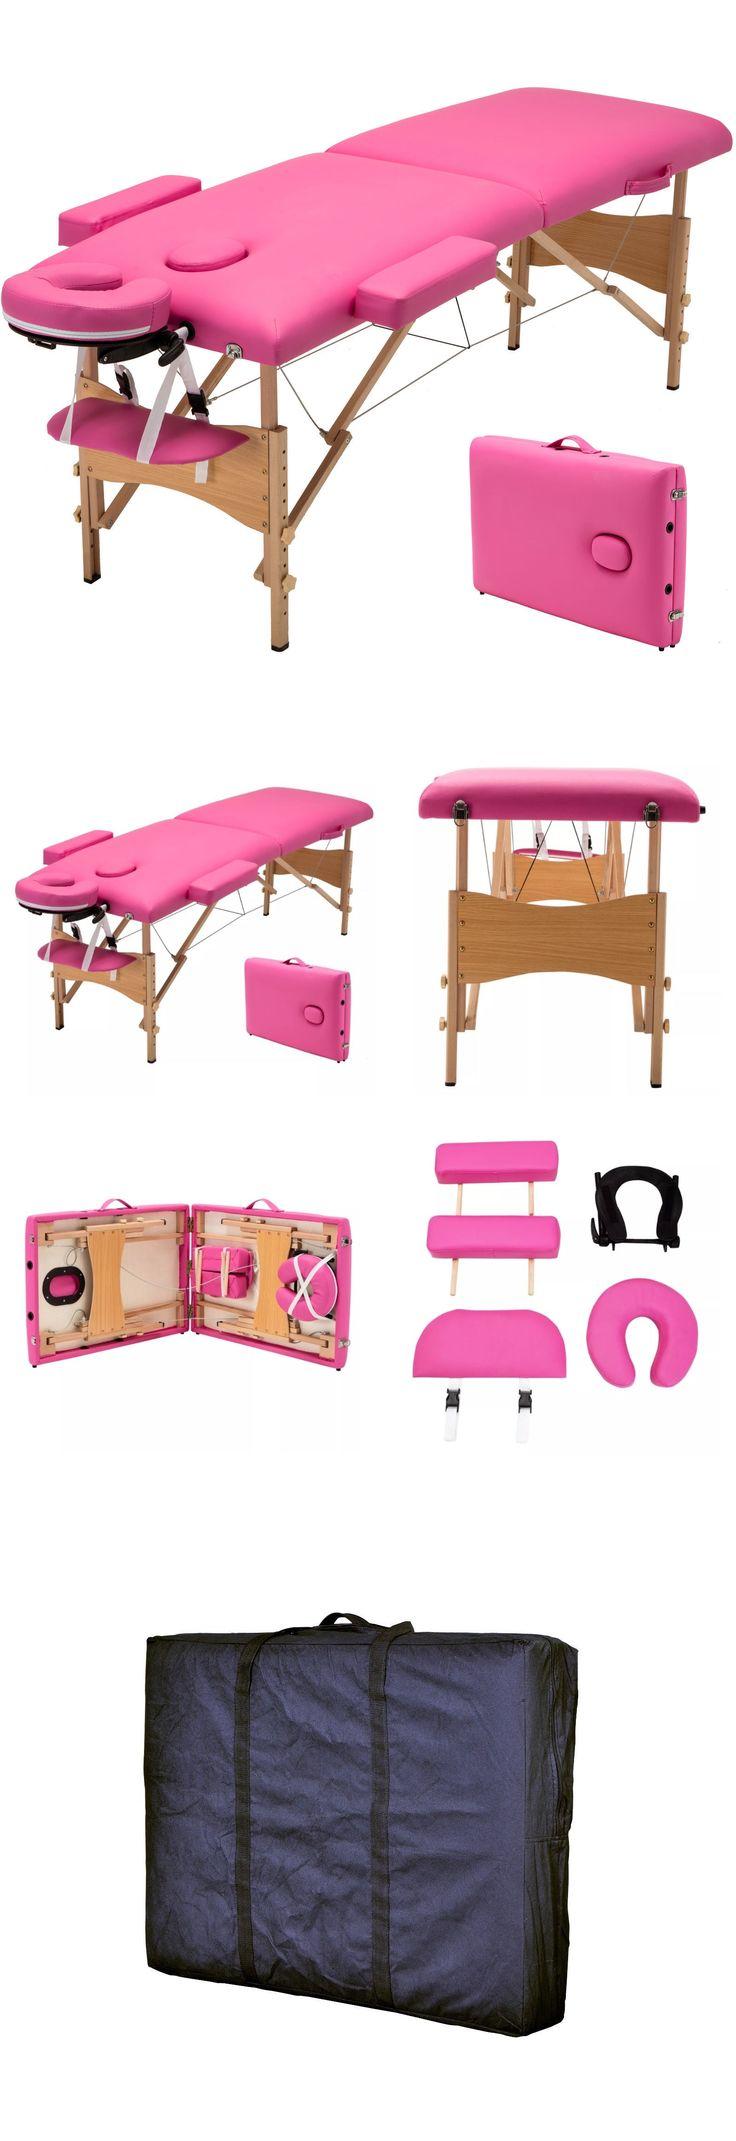 Eyelash Tools: New Pink Eyelash Extension Training Bed Kit Furniture Equipment Glue (Portable) BUY IT NOW ONLY: $94.99